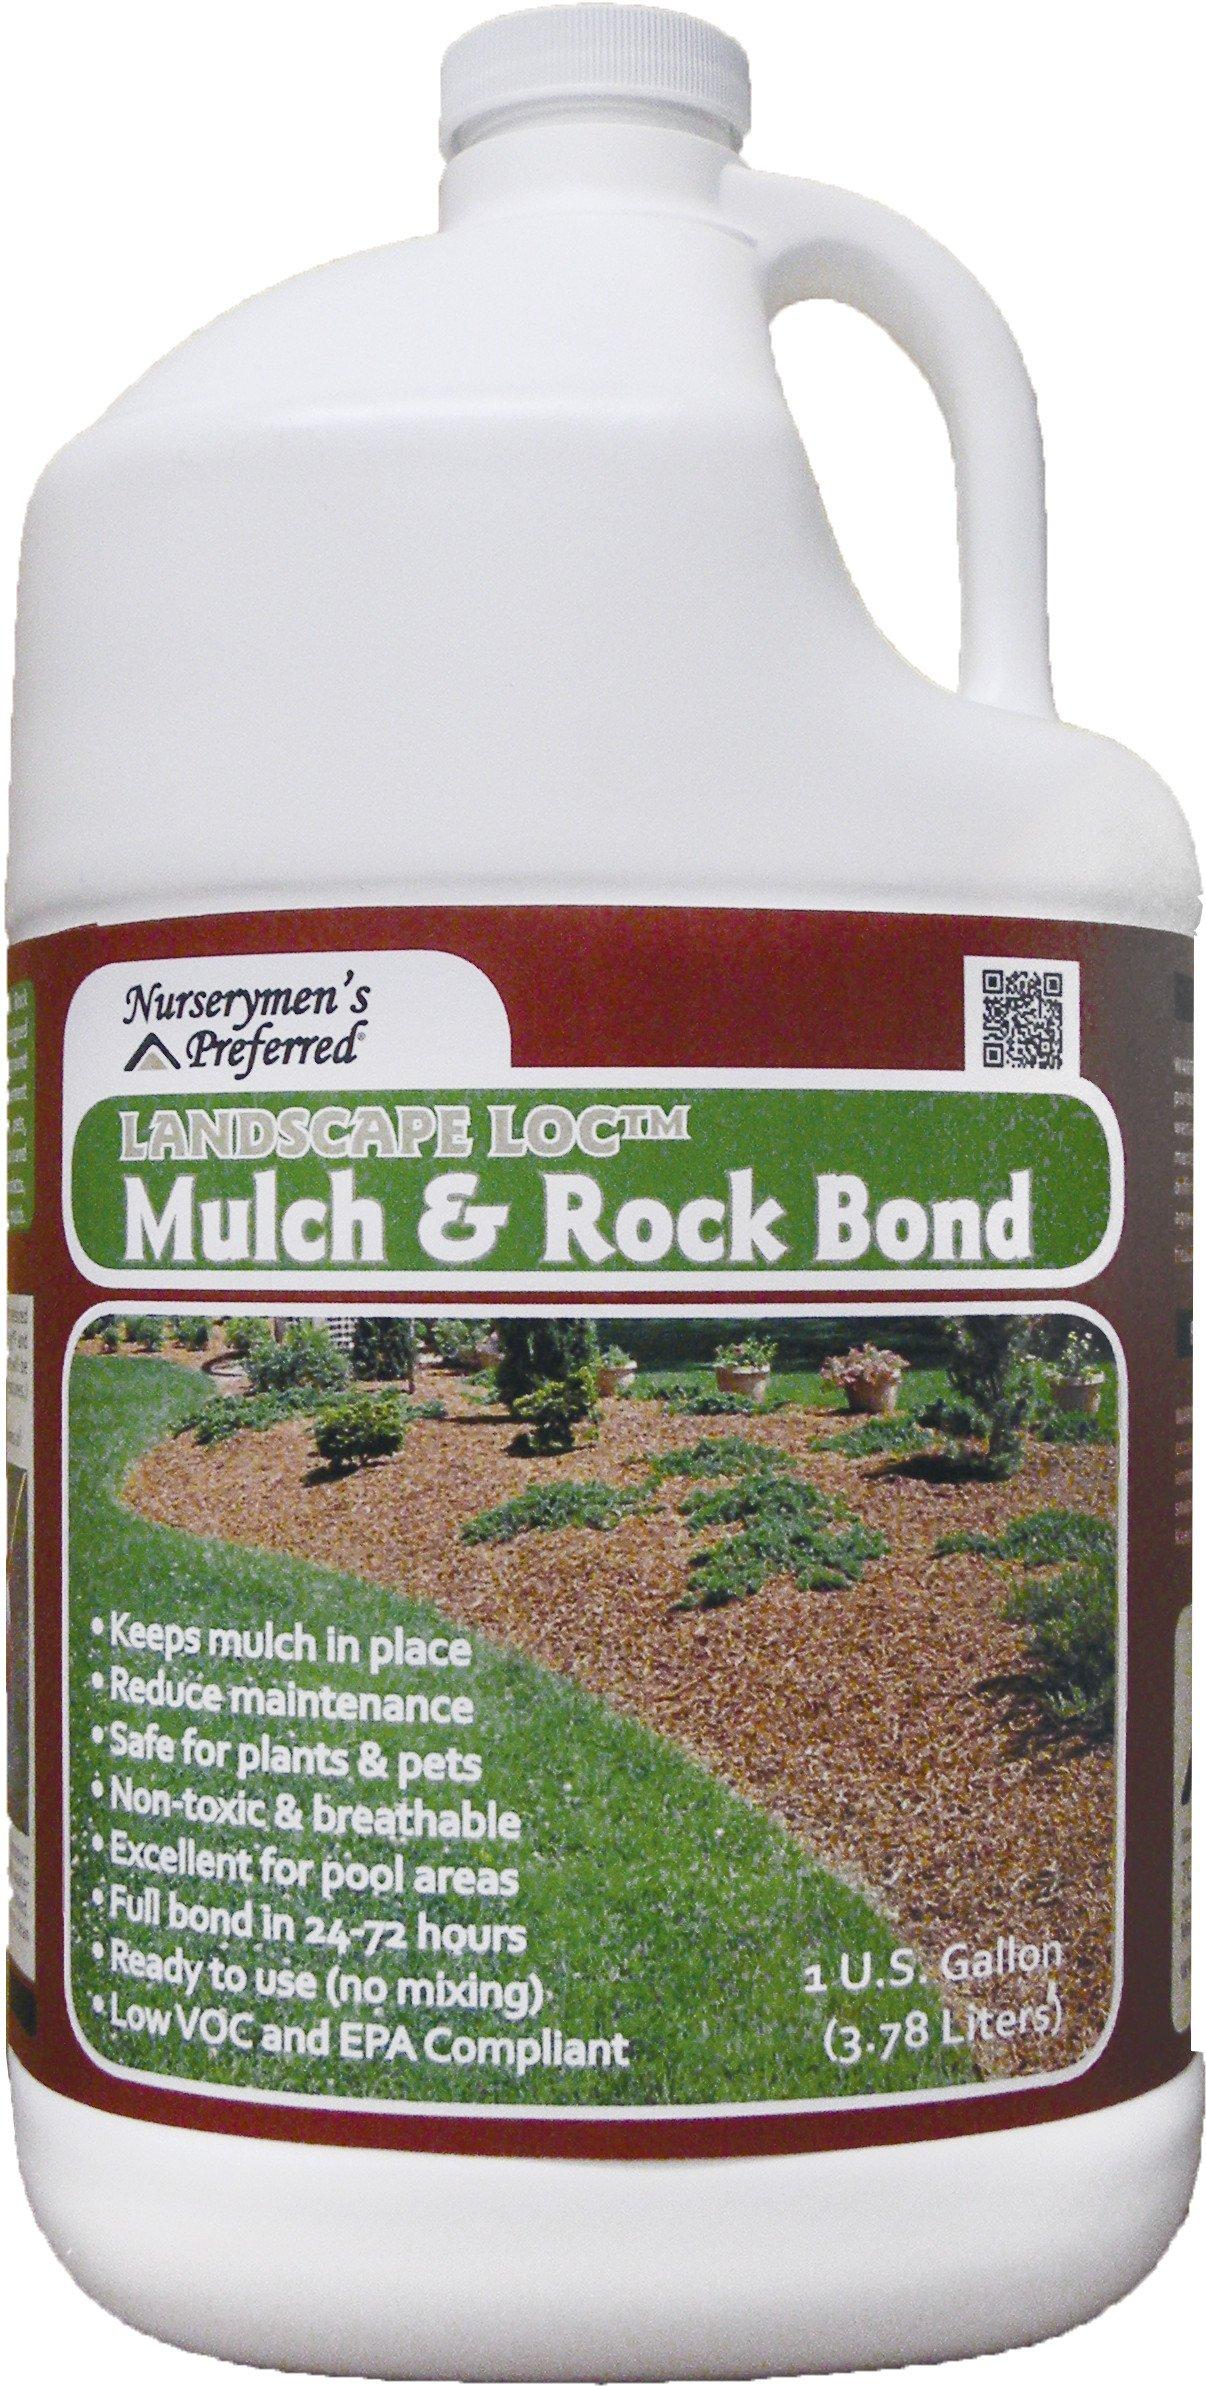 Nurserymen's Preferred Landscape Loc Mulch & Rock Bond - 1 Gal. (4 Pack)